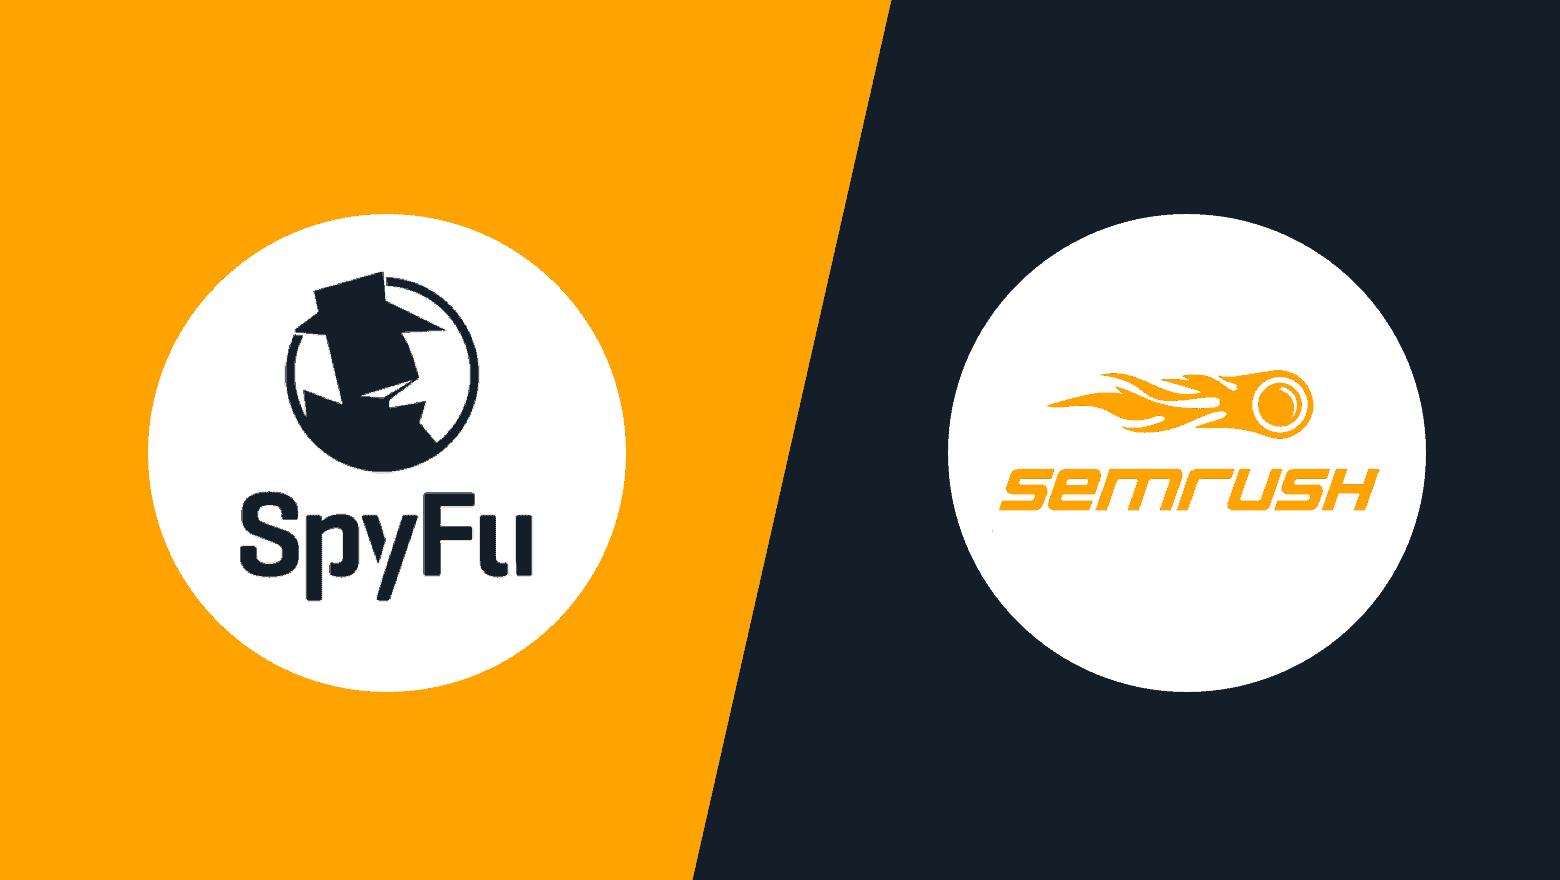 spyfu vs semrush icon